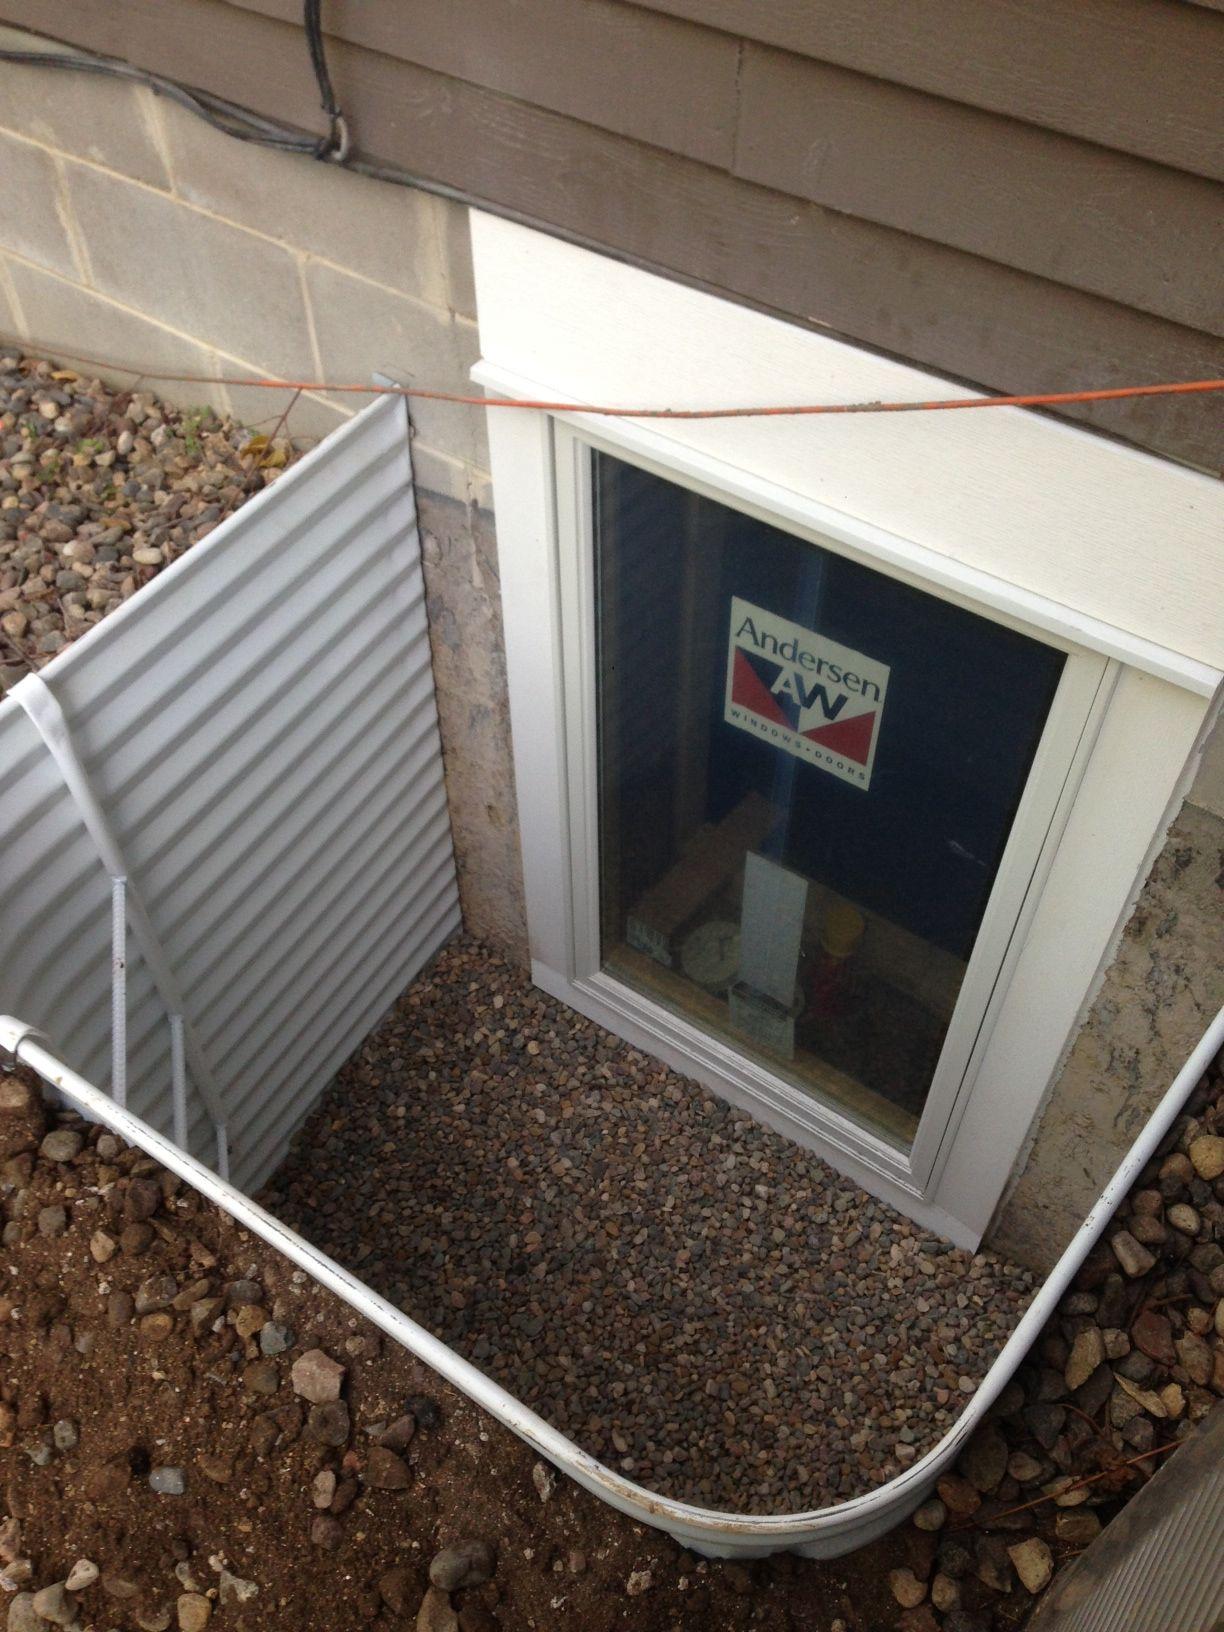 White Metal Well Affordable Egress Windows Basement Waterproofing Llc 763 267 3891 Egress Window Well Egress Window Window Well